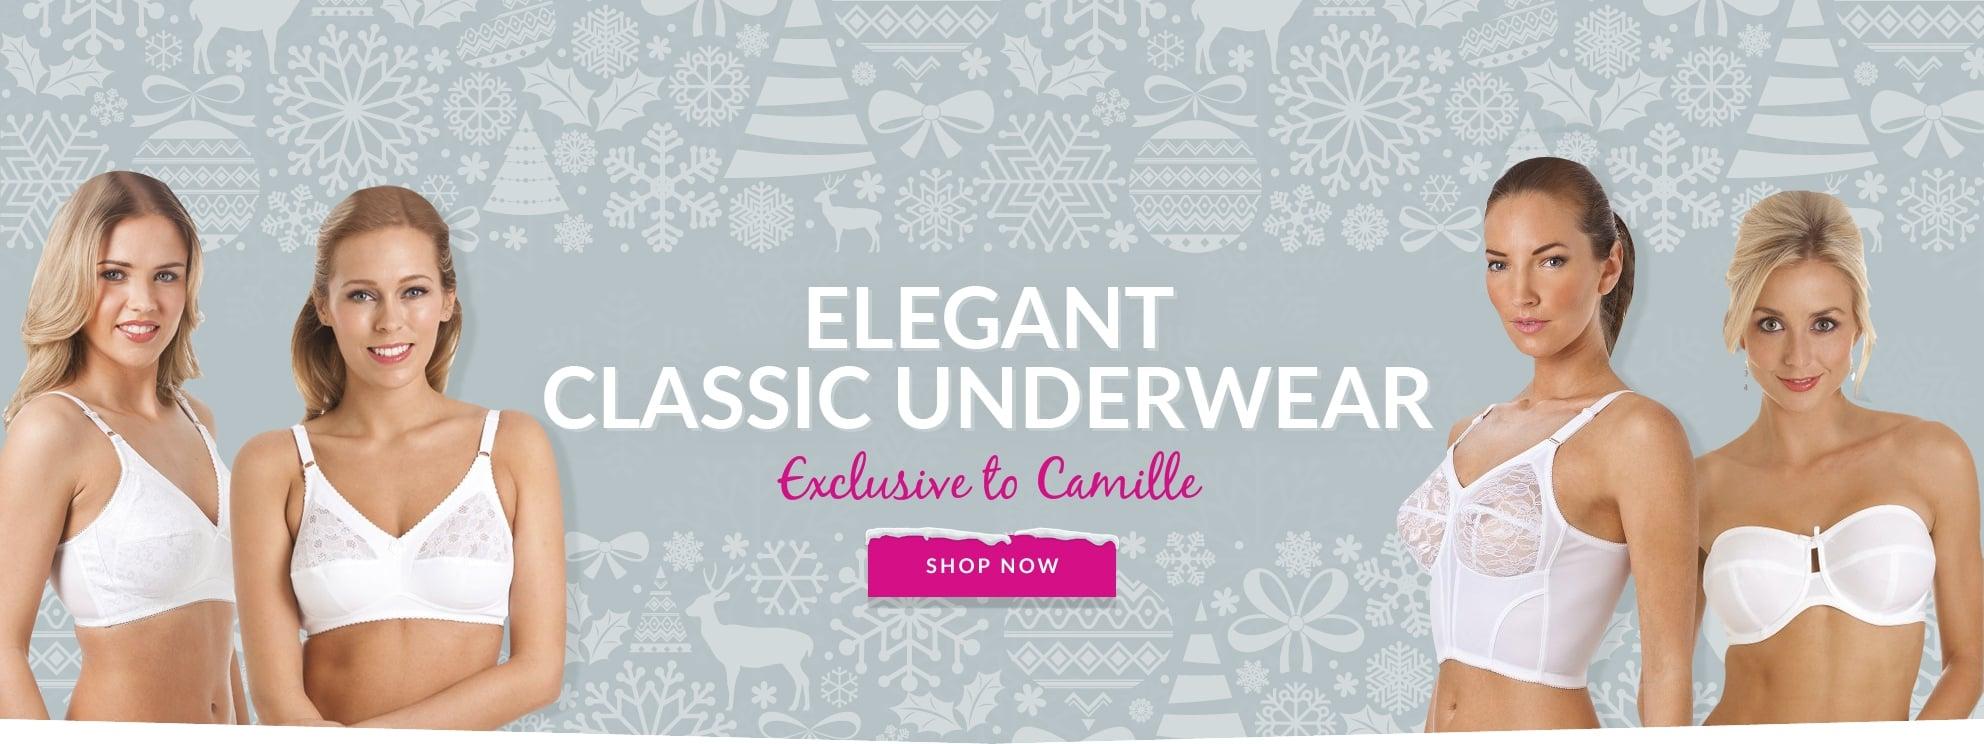 Best Classic Underwear from Camille